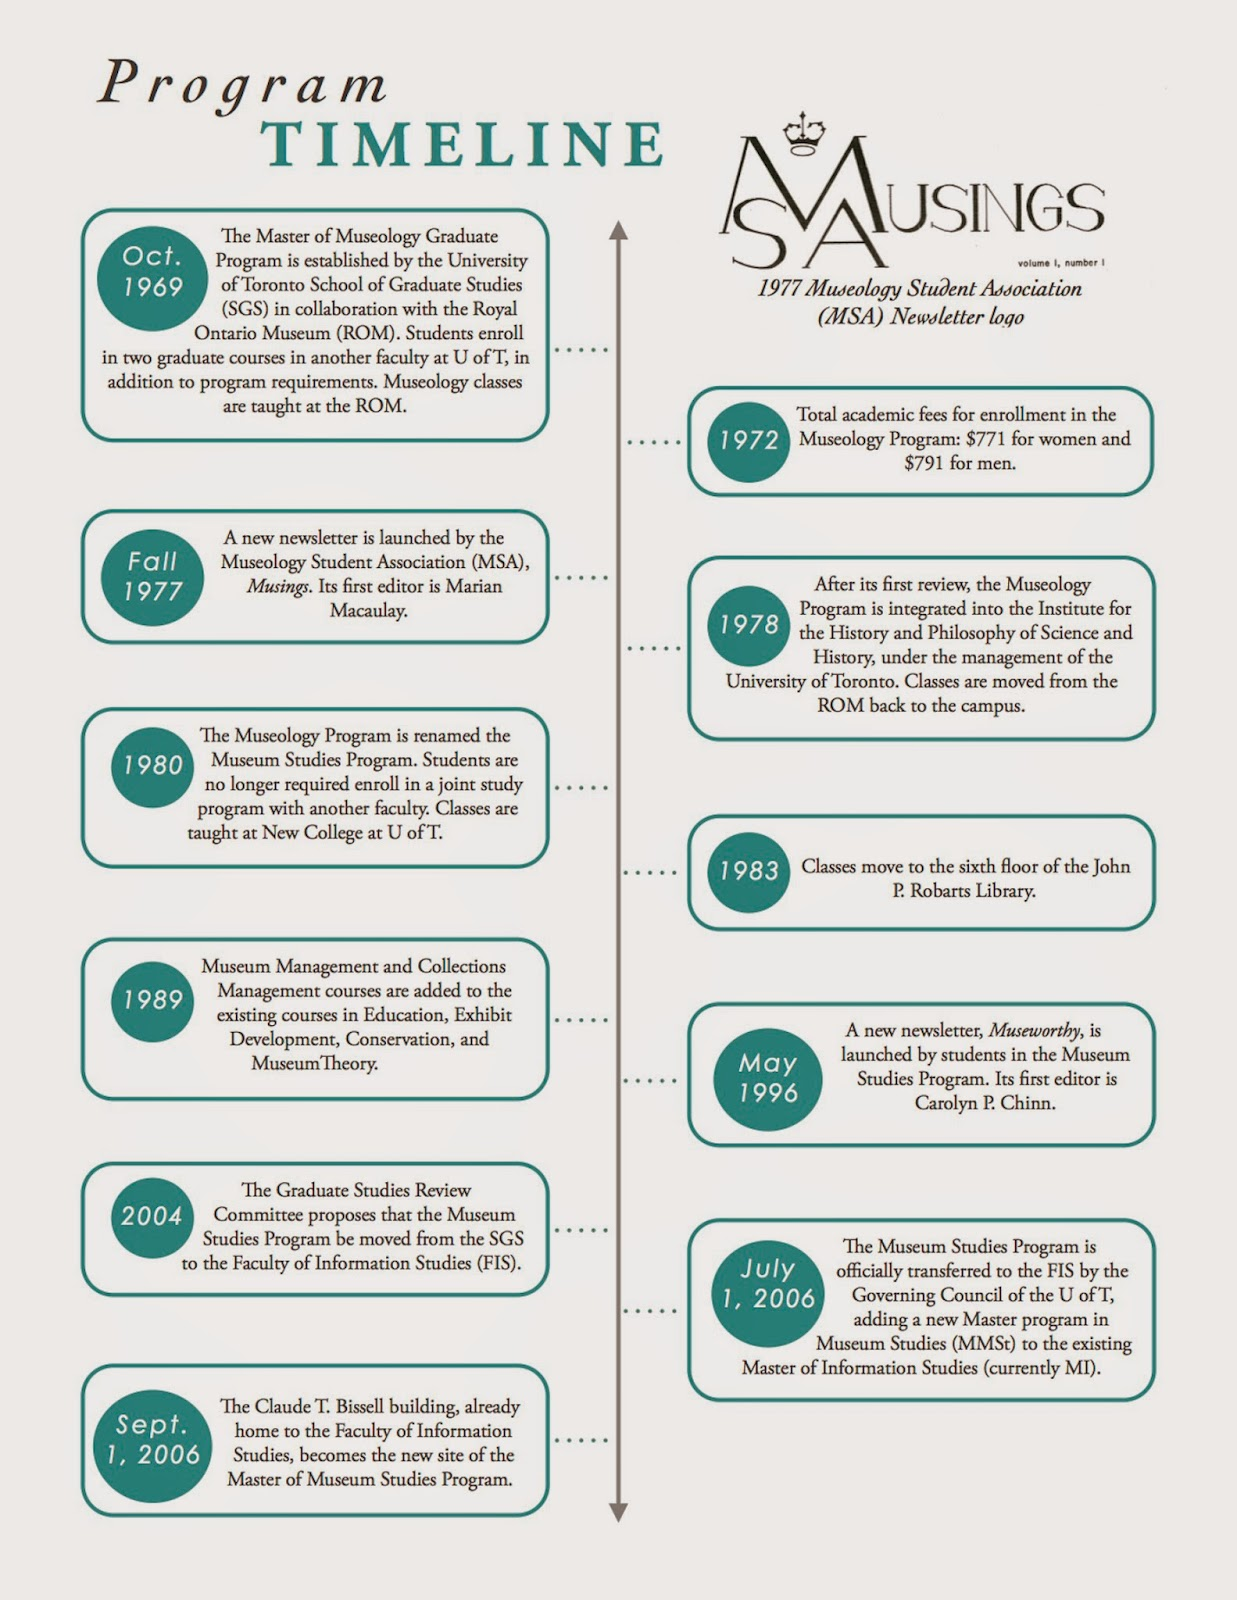 Unviersity of Toronto's Master of Museum Studies Program Timeline